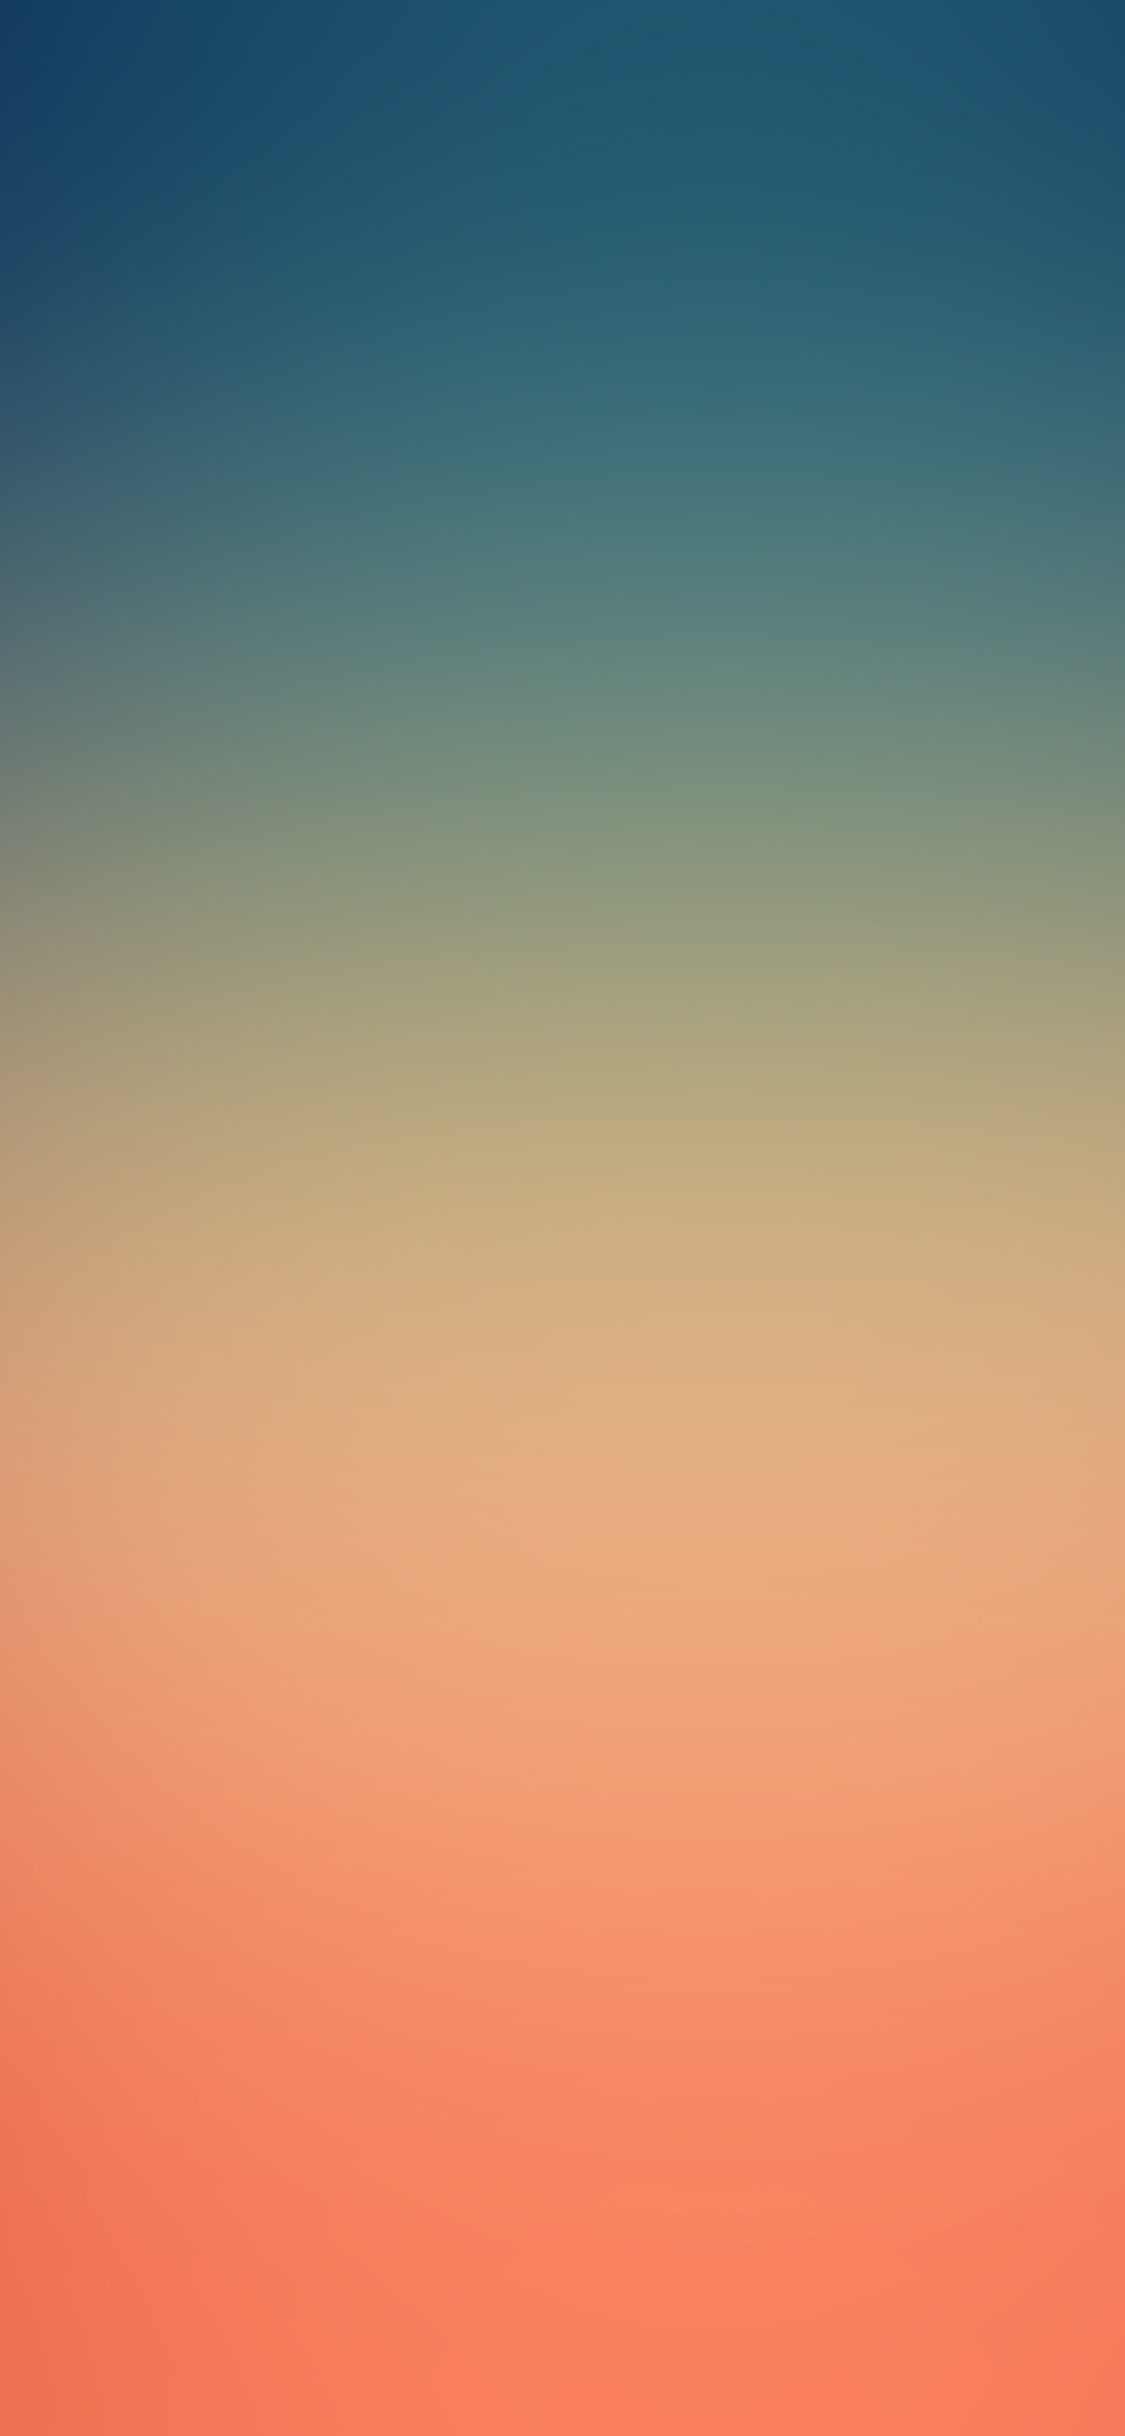 iPhoneXpapers.com-Apple-iPhone-wallpaper-sk83-blue-orange-night-blur-gradation